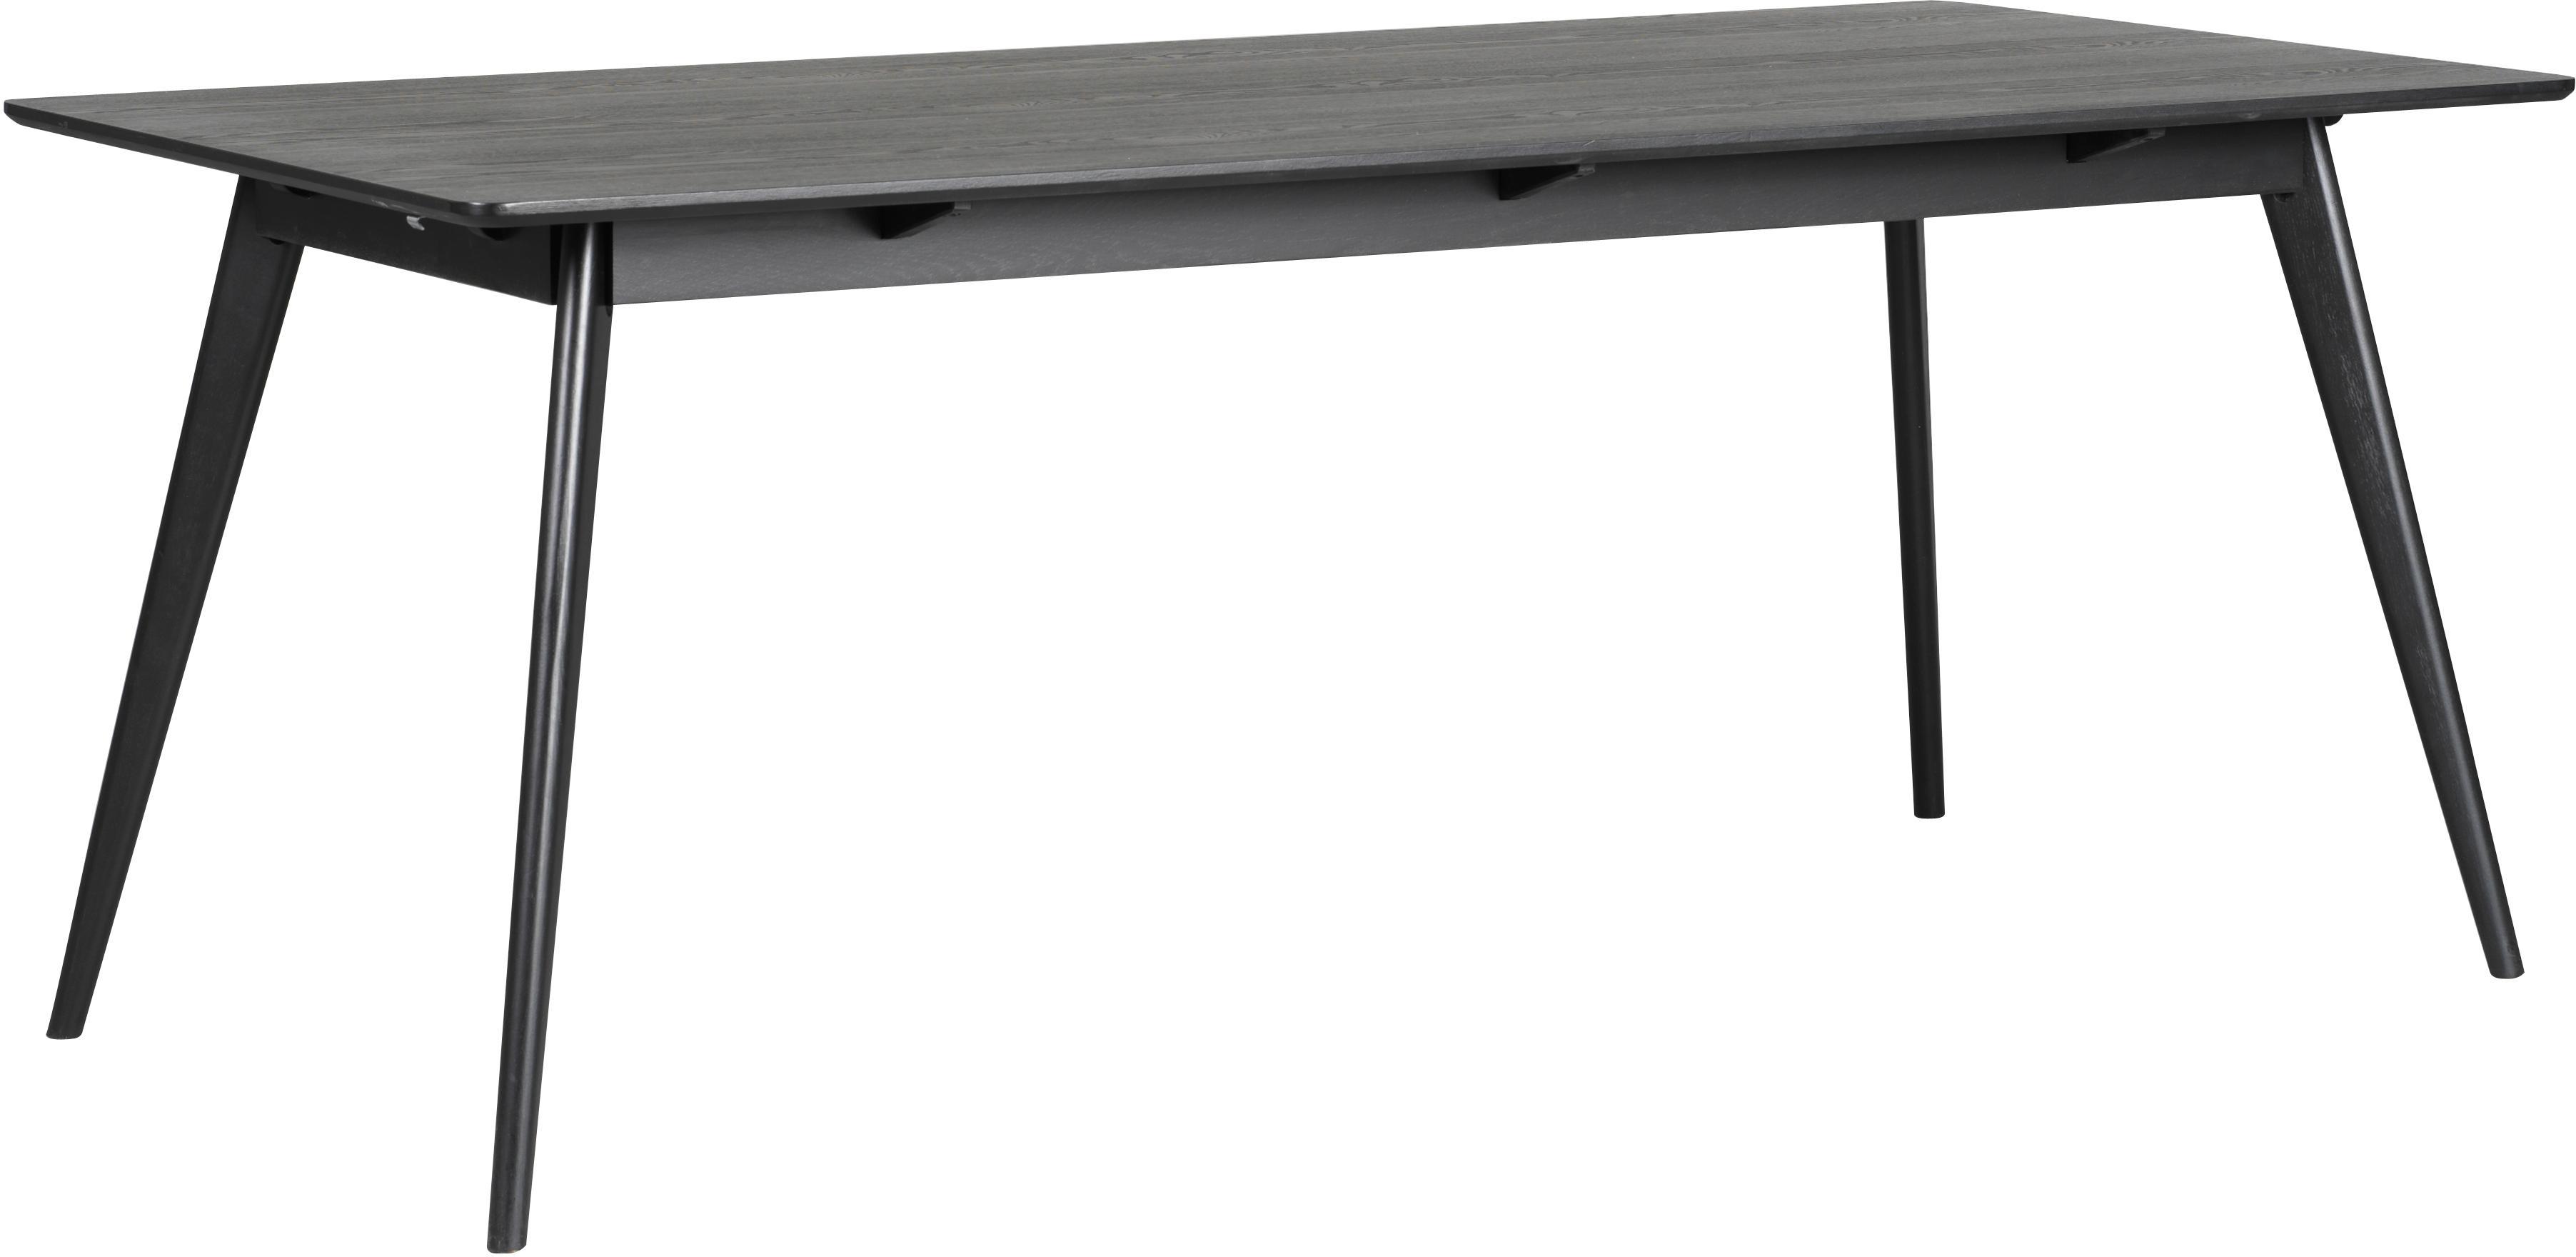 Mesa de comedor de madera Yumi, Tablero: tablero de fibras de dens, Patas: madera de caucho maciza c, Negro mate, An 190 x F 90 cm